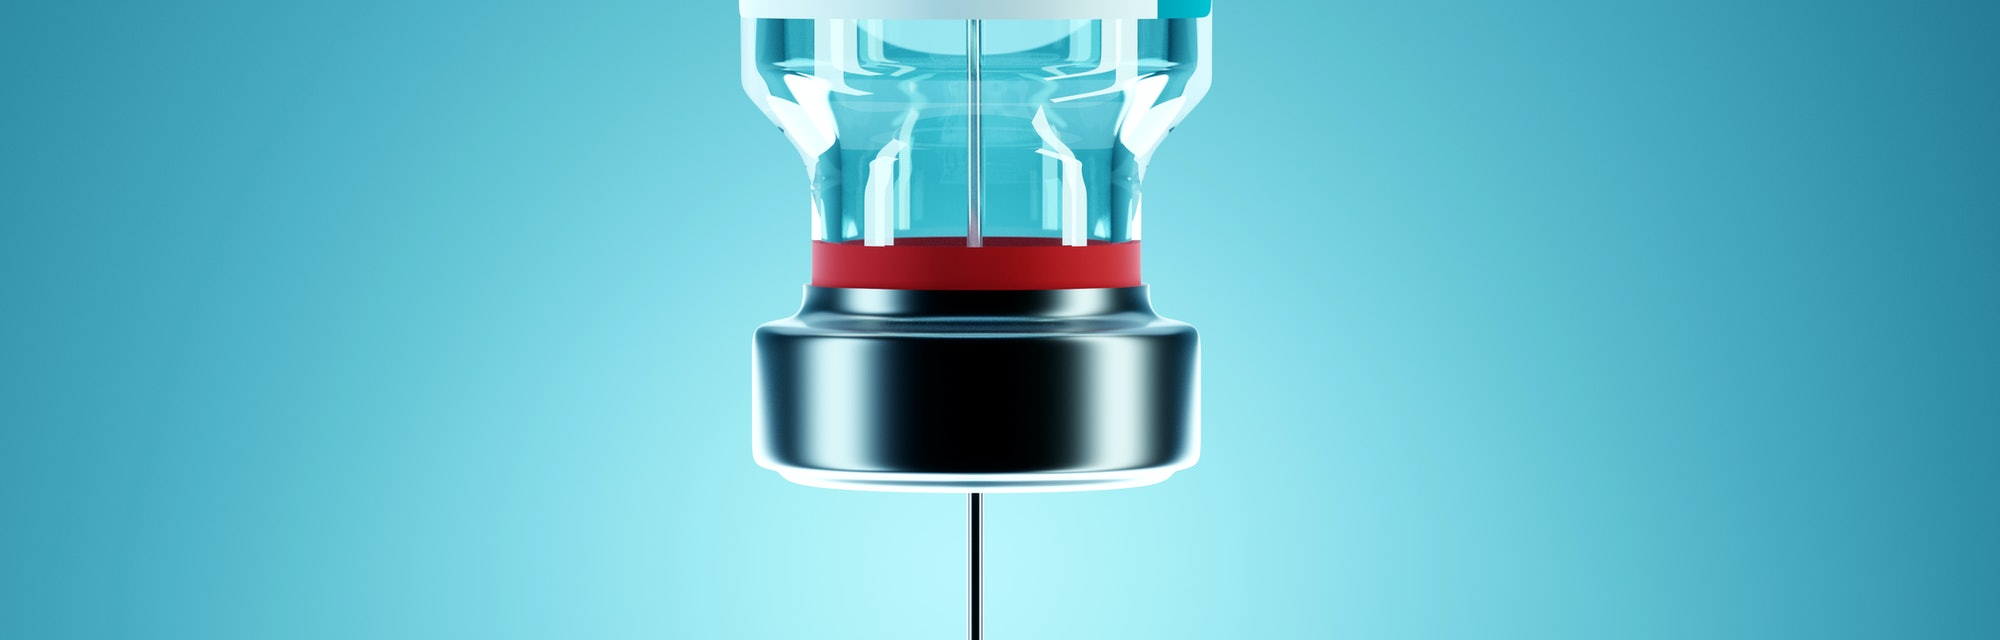 SARS - CoV2 Vaccine concept. A medical needle entering into a glass vial of COVID-19 Vaccine. Medica...